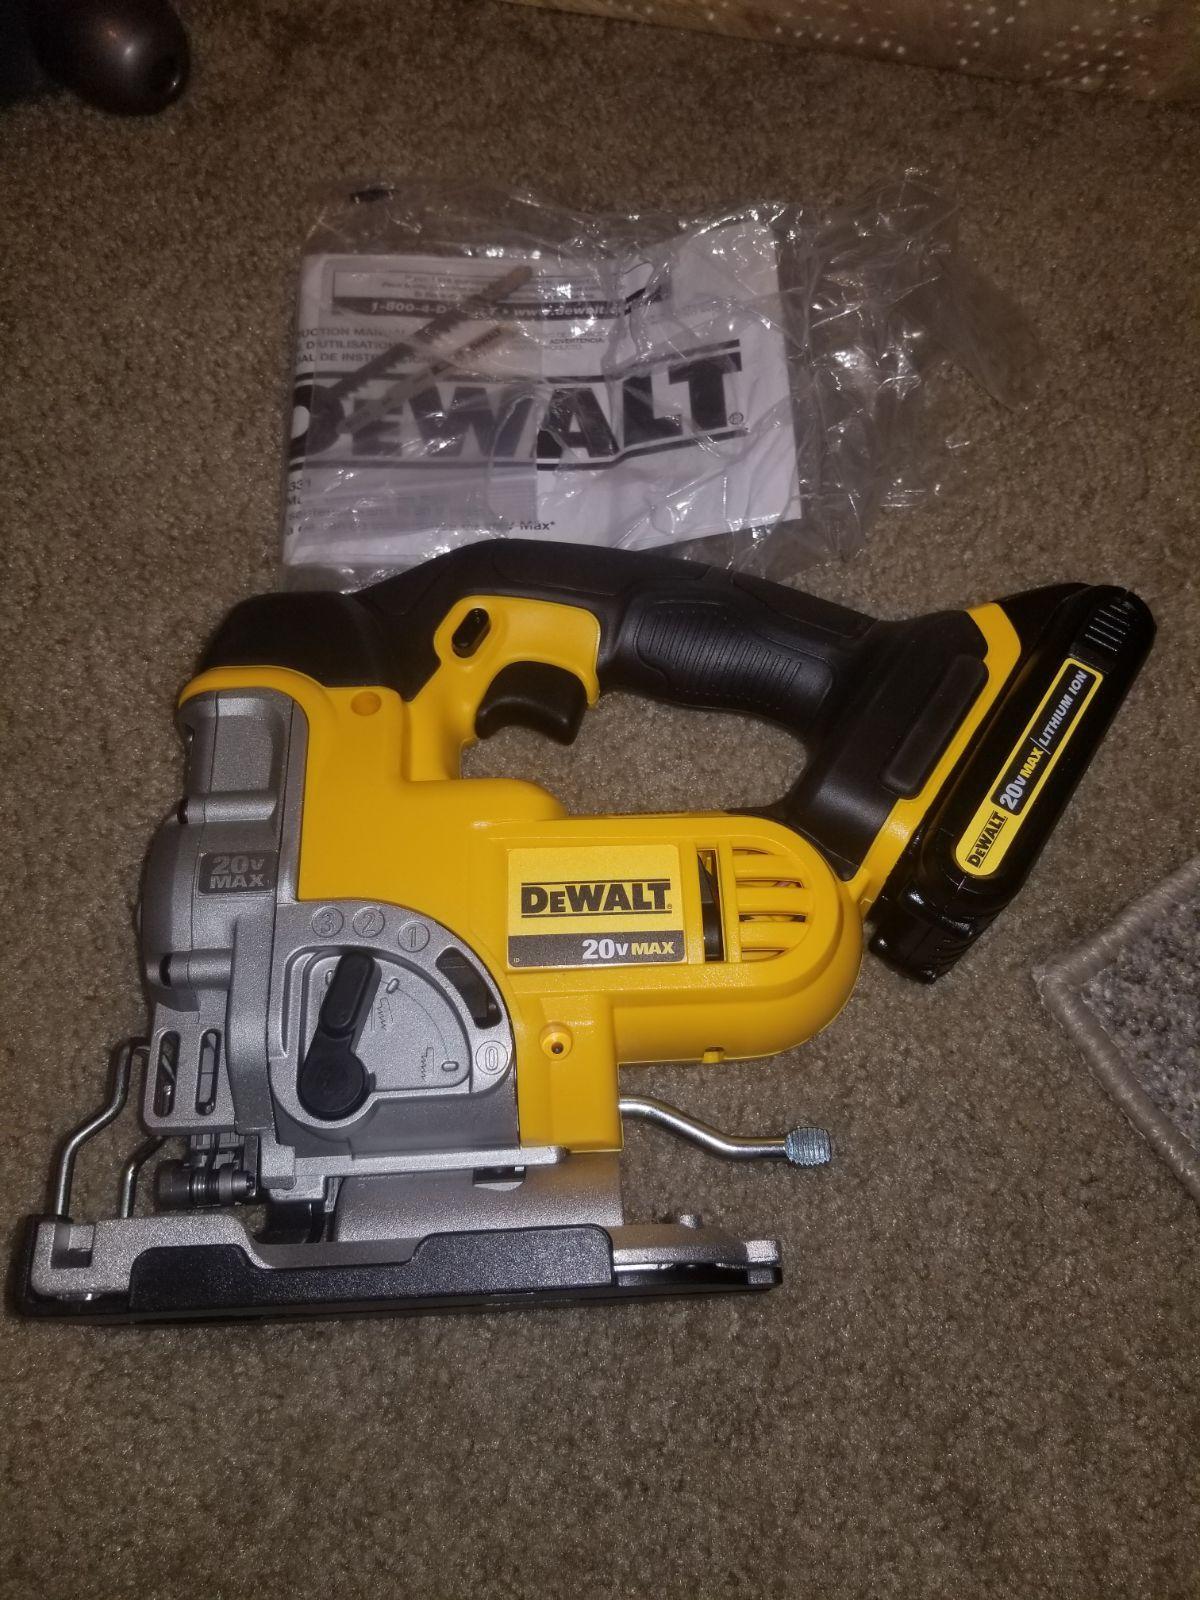 Pin On Dewalt Tools Equipment